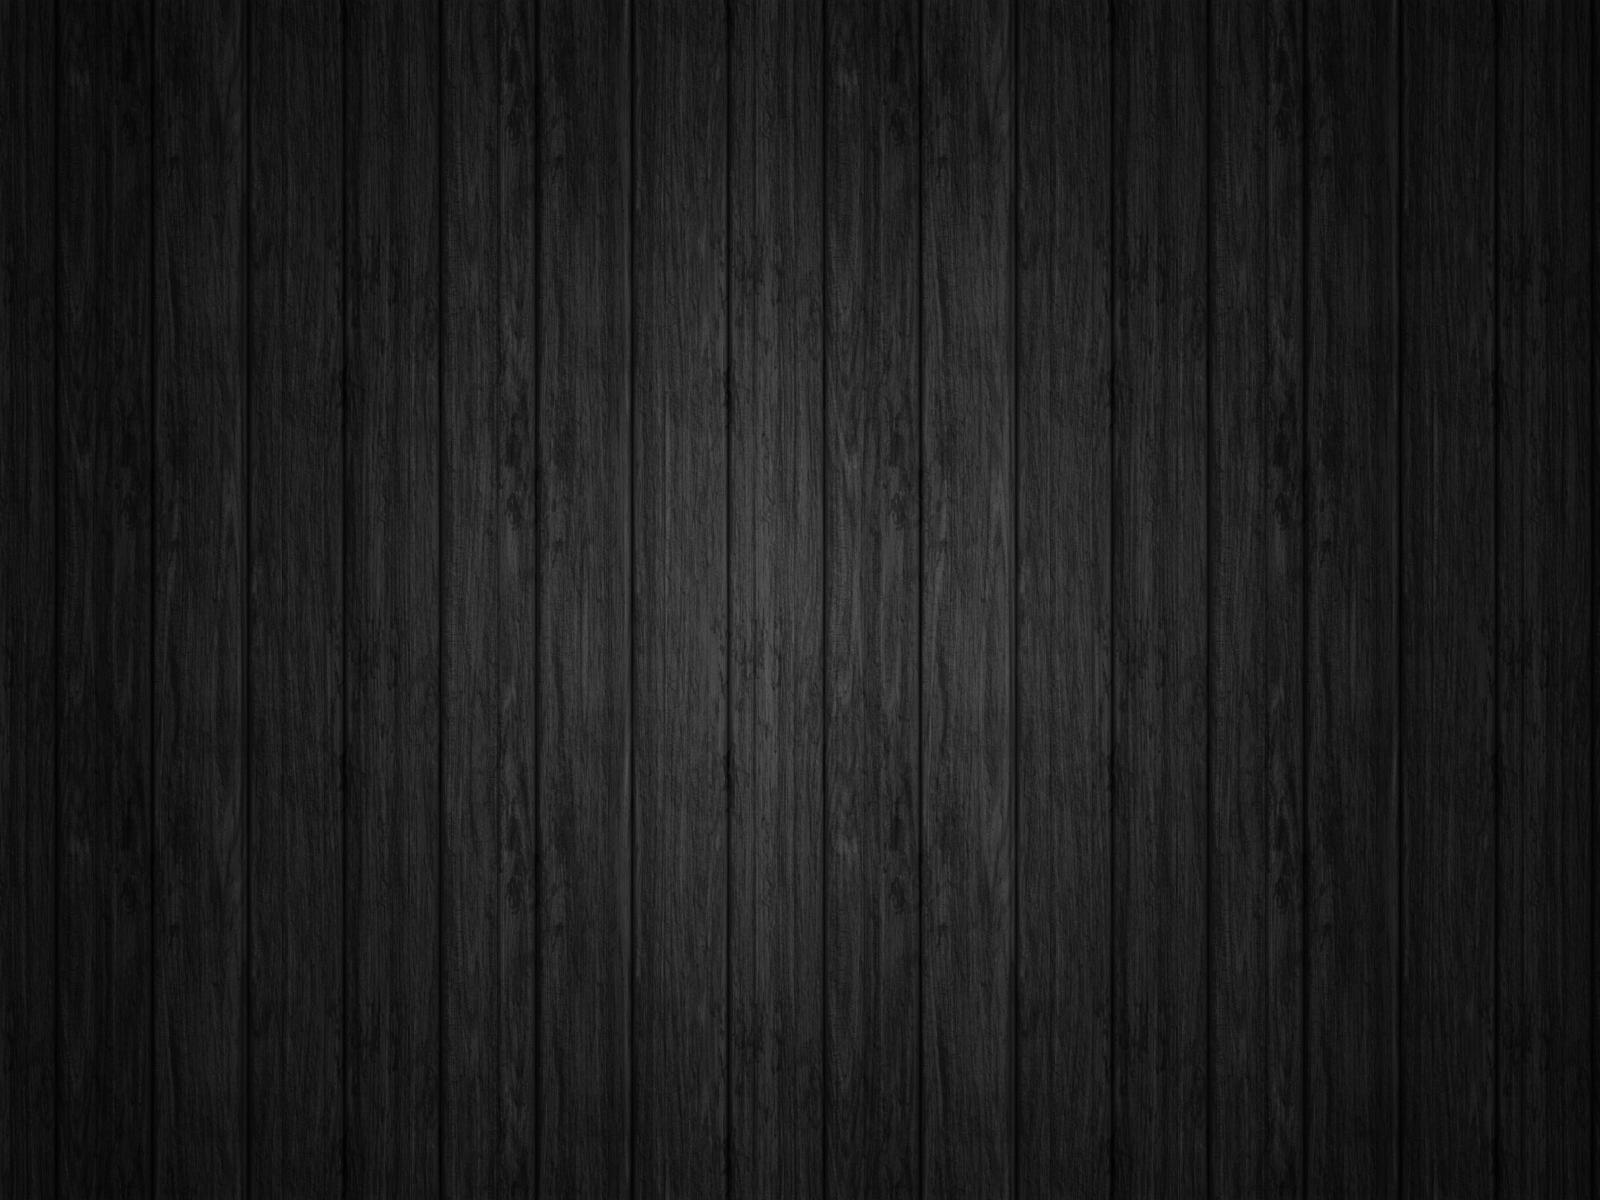 central wallpaper dark patterns hd wallpapers